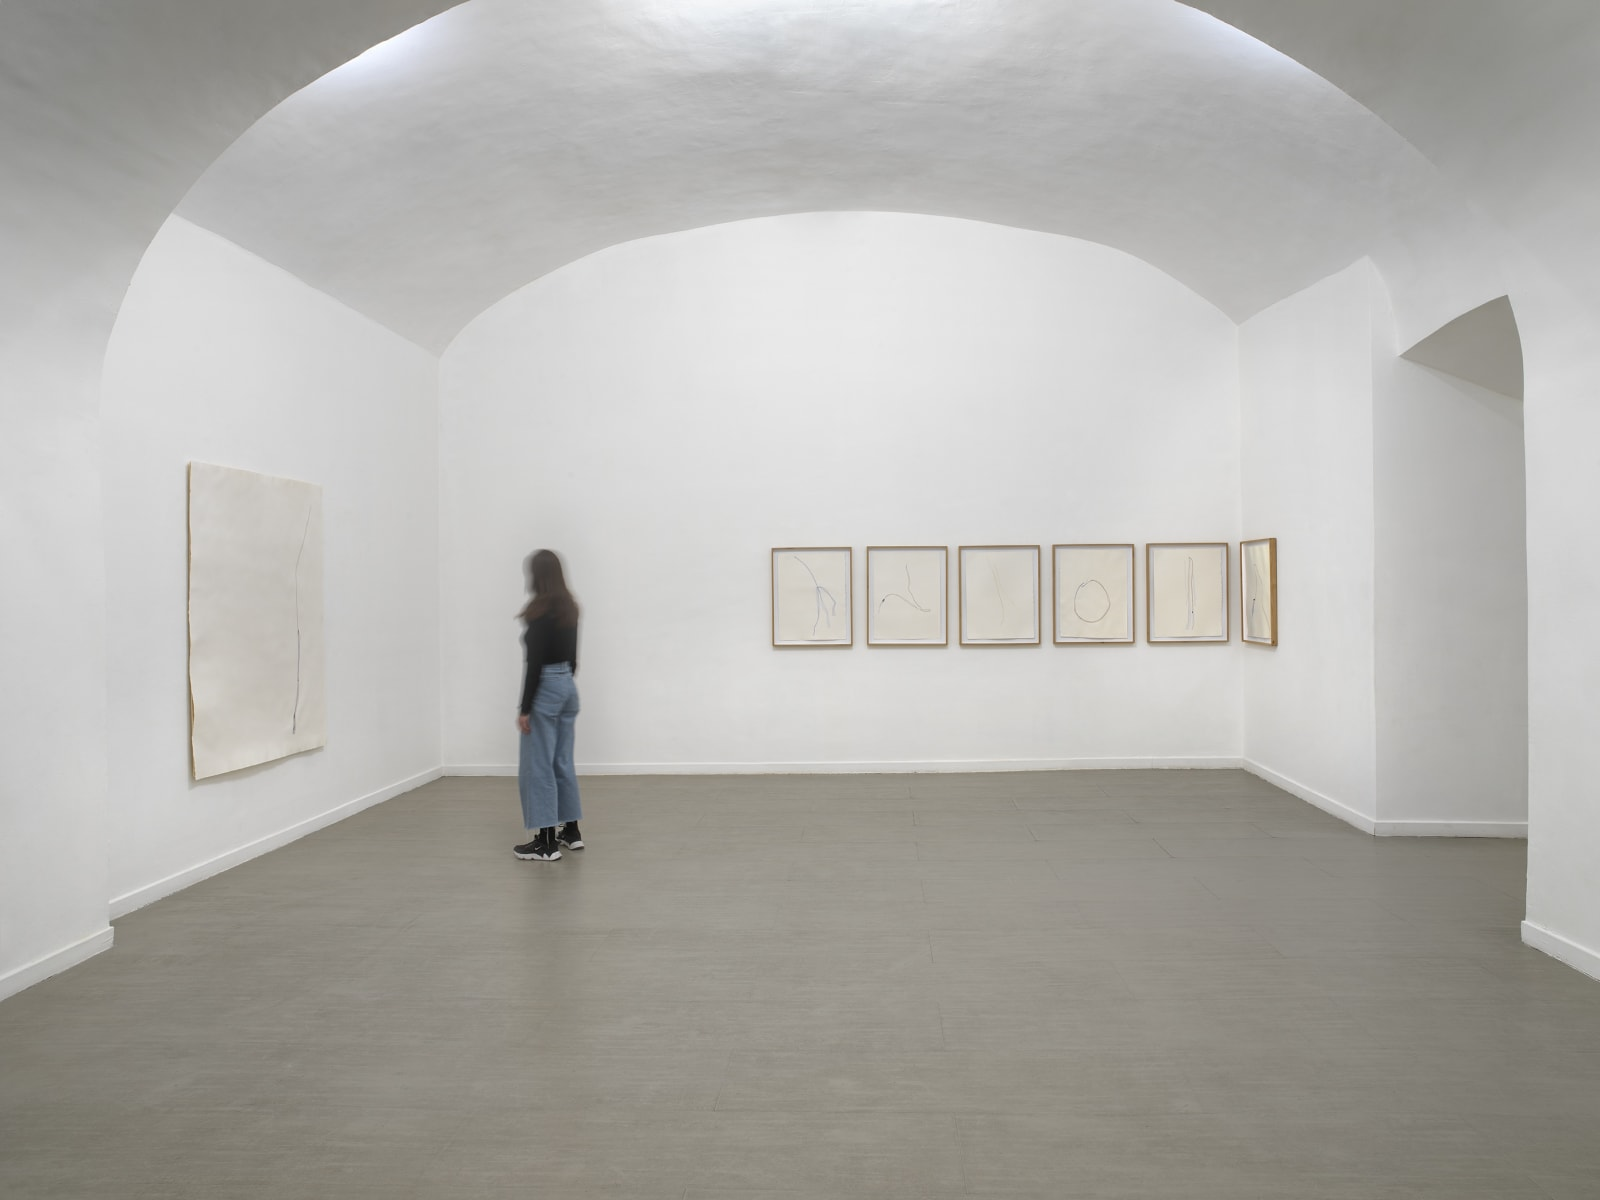 Beatrice Pediconi Nude curated by Cecilia Canziani installation view of the third room ph. Dario Lasagni